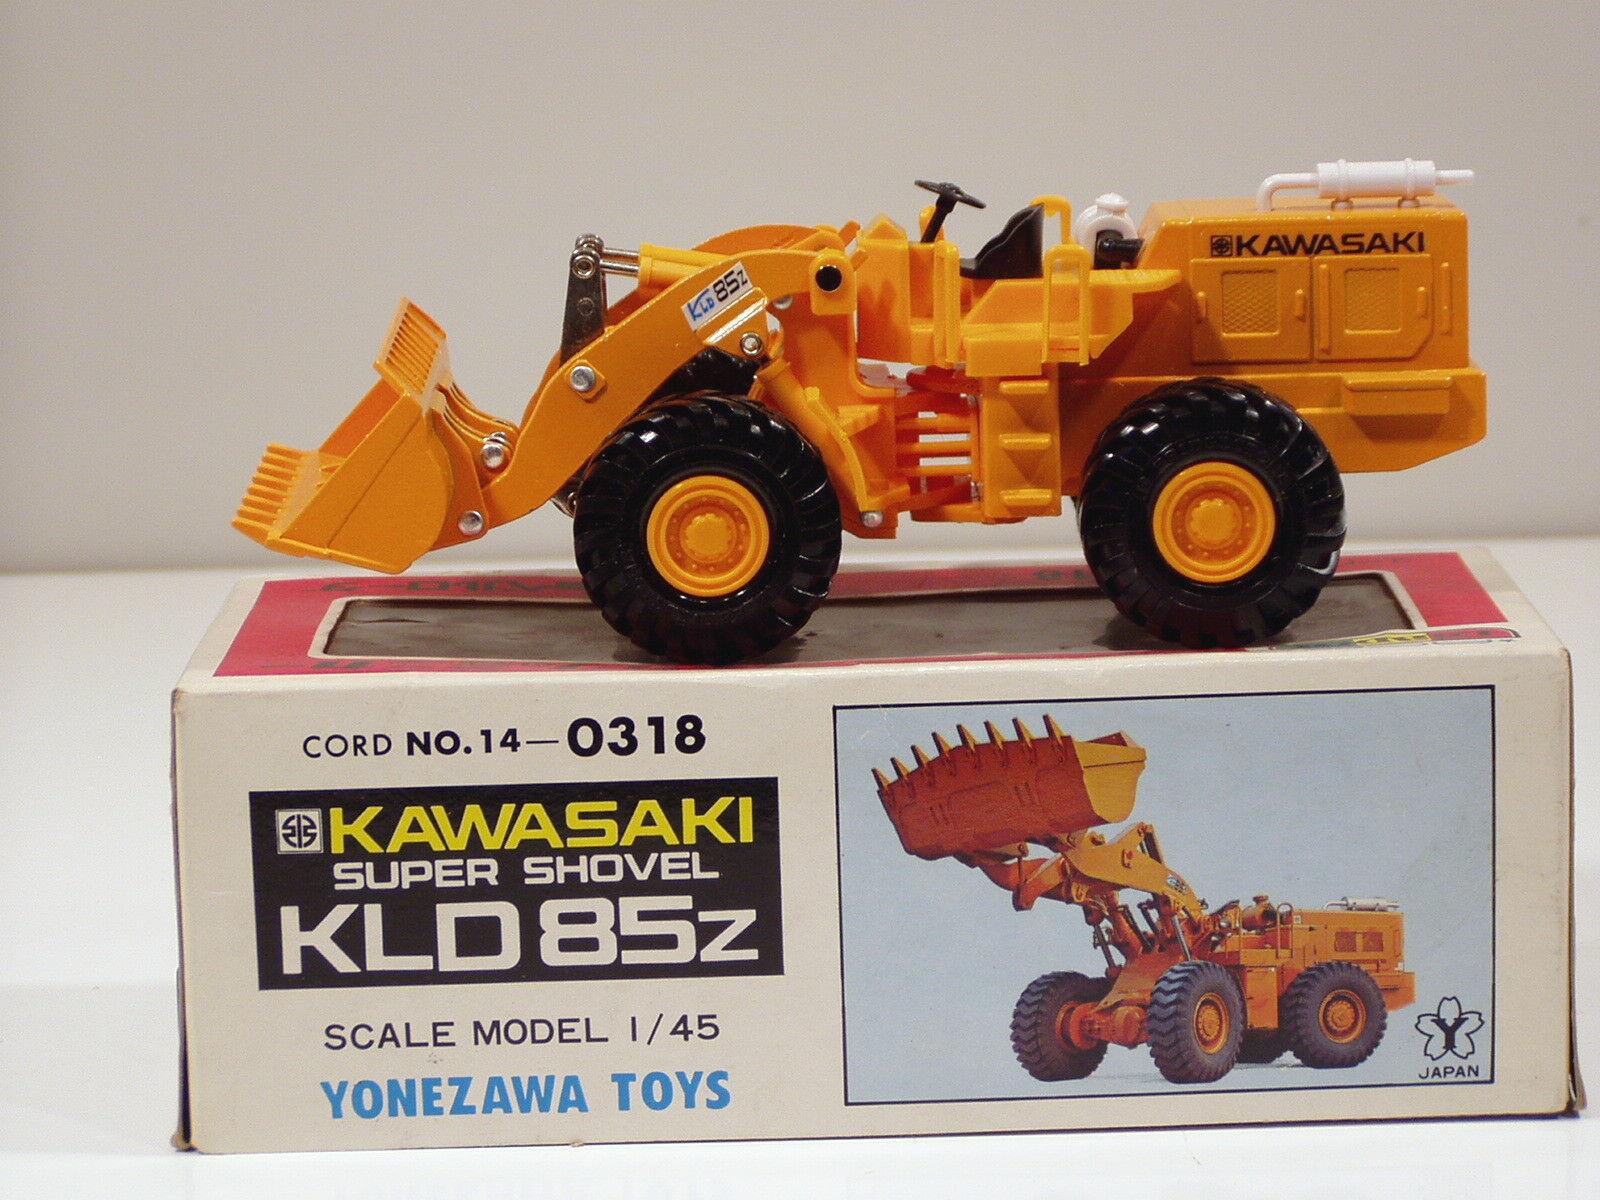 Cochegador De Kawasaki KLD85z - 1 45 - DIAPET  K-13 - MIB